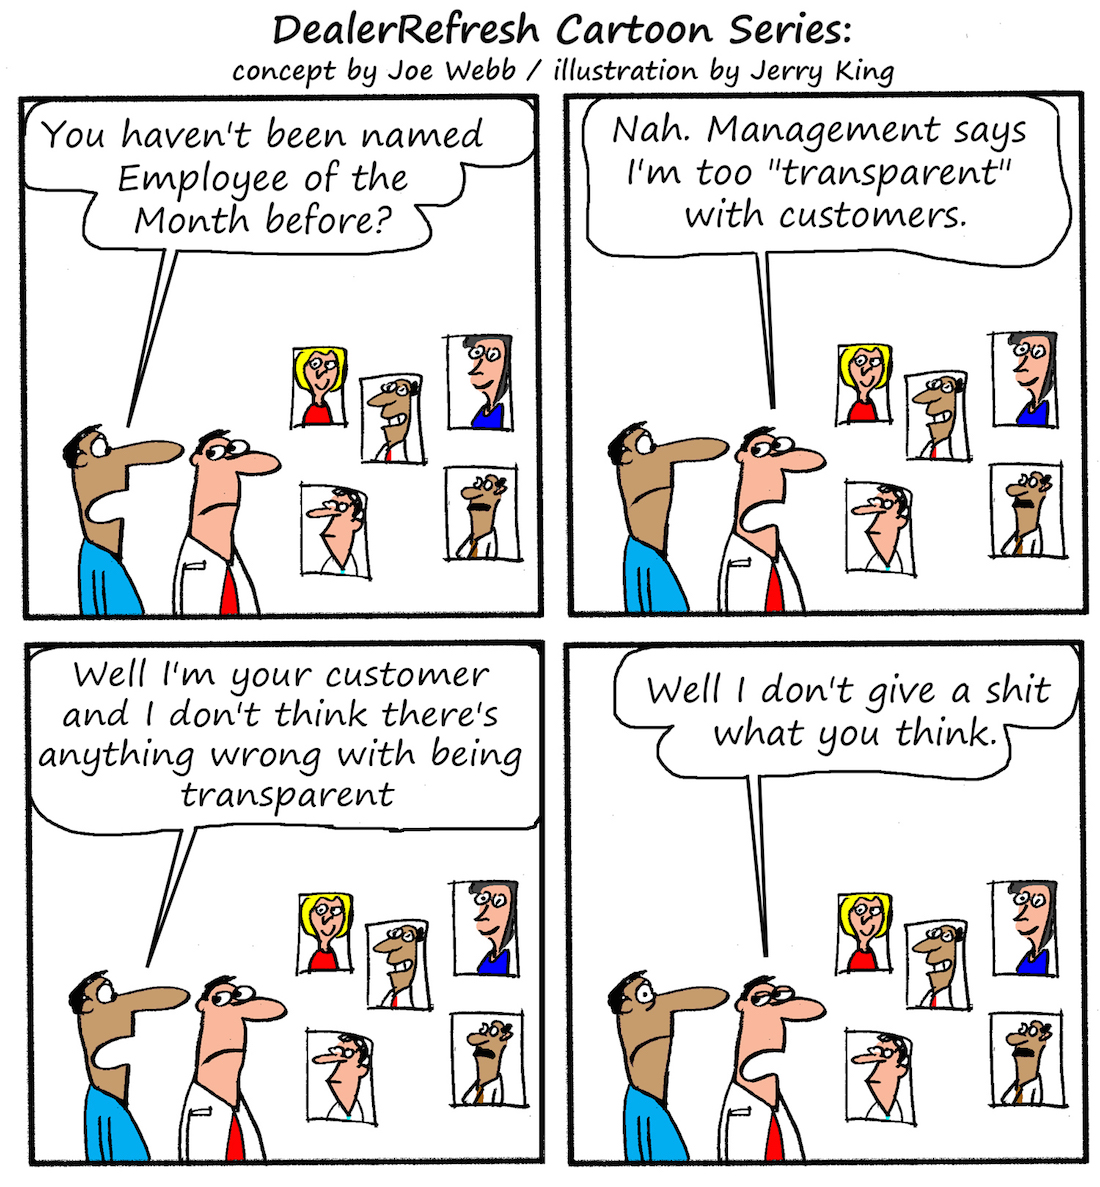 DealerRefresh cartoon series transparent employee of the month